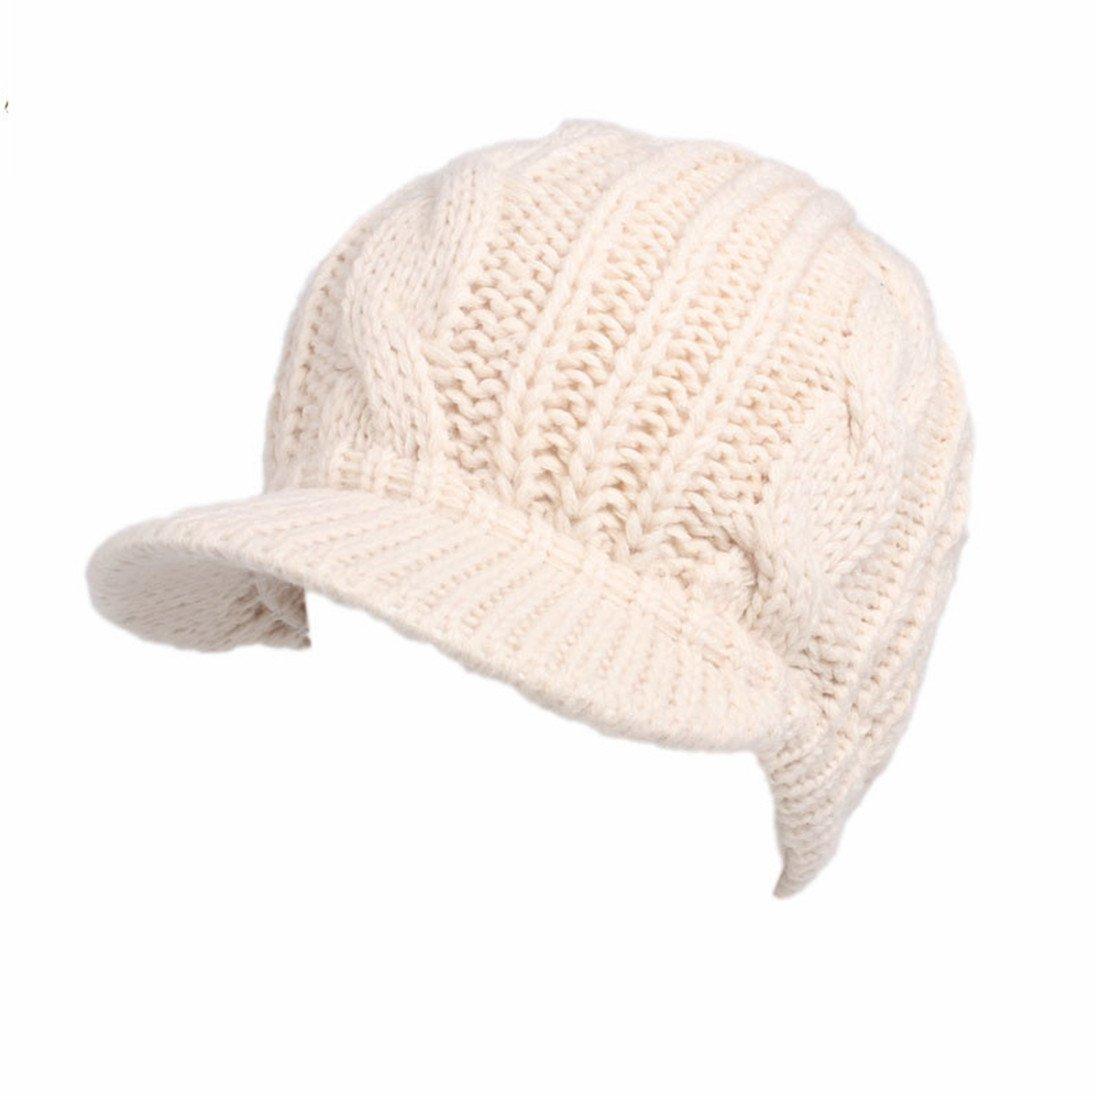 Gorro de punto/Beret/100-dimensional hat/caliente tejer boina ...